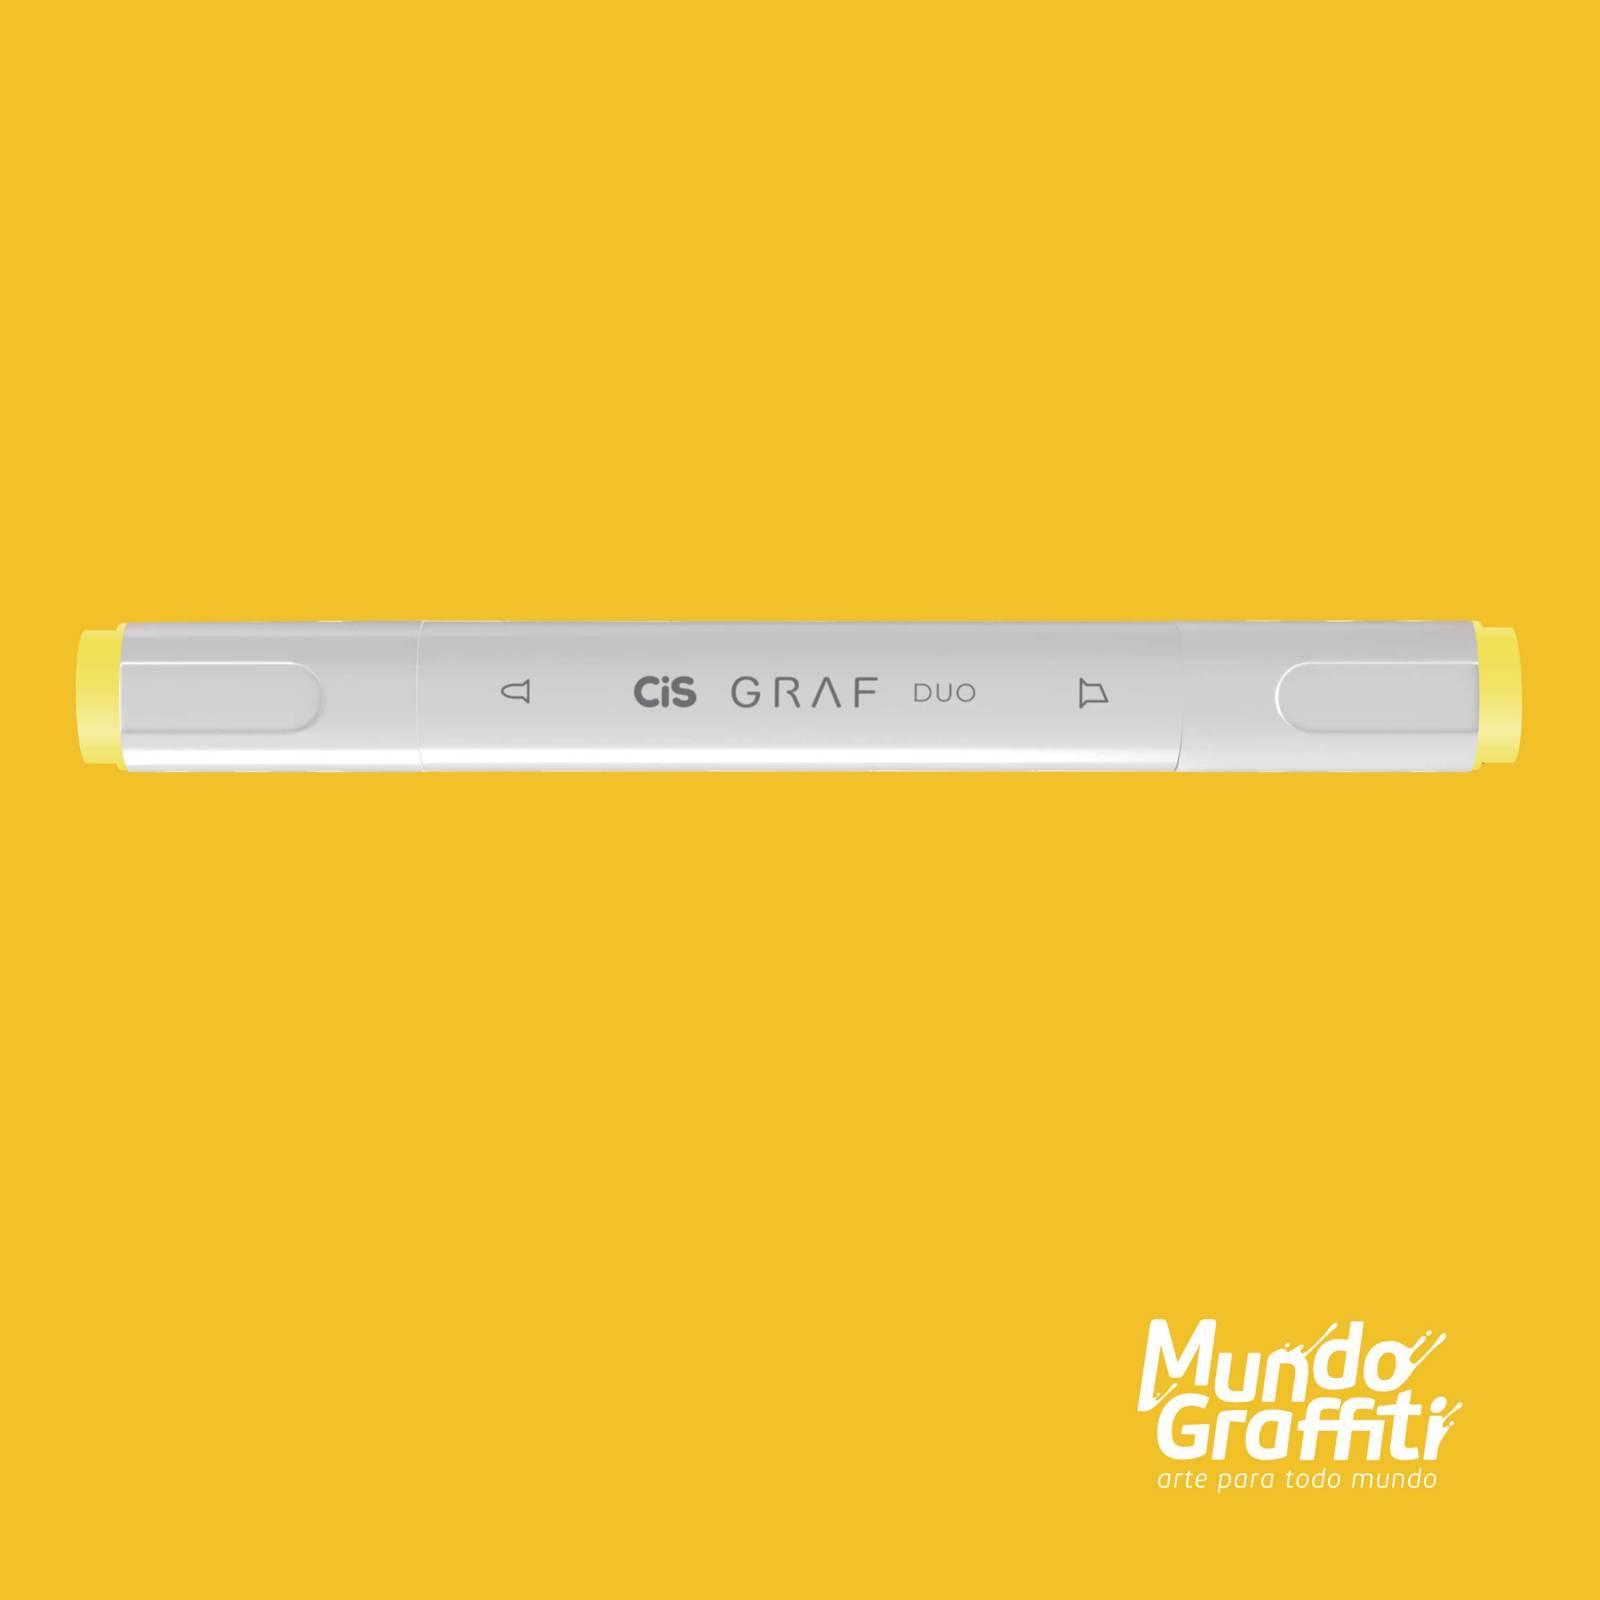 Marcador Cis Graf Duo Melon Yellow 33 - Mundo Graffiti